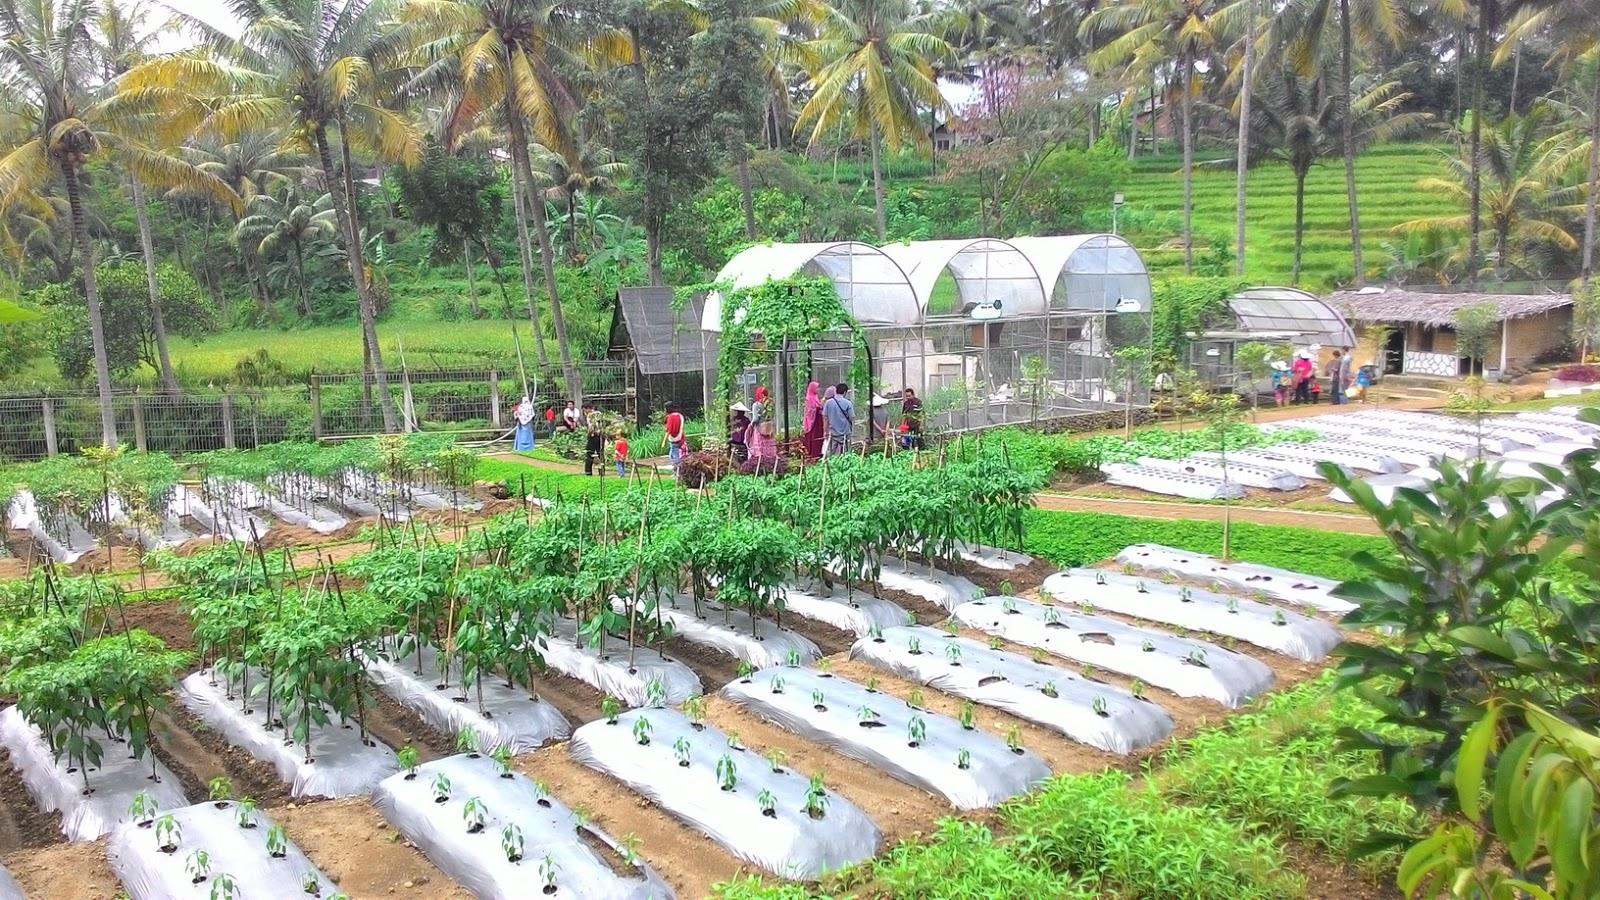 Semarang Coret 10 Tempat Wisata Ngehits Kabupaten Taman Djamoe Indonesia